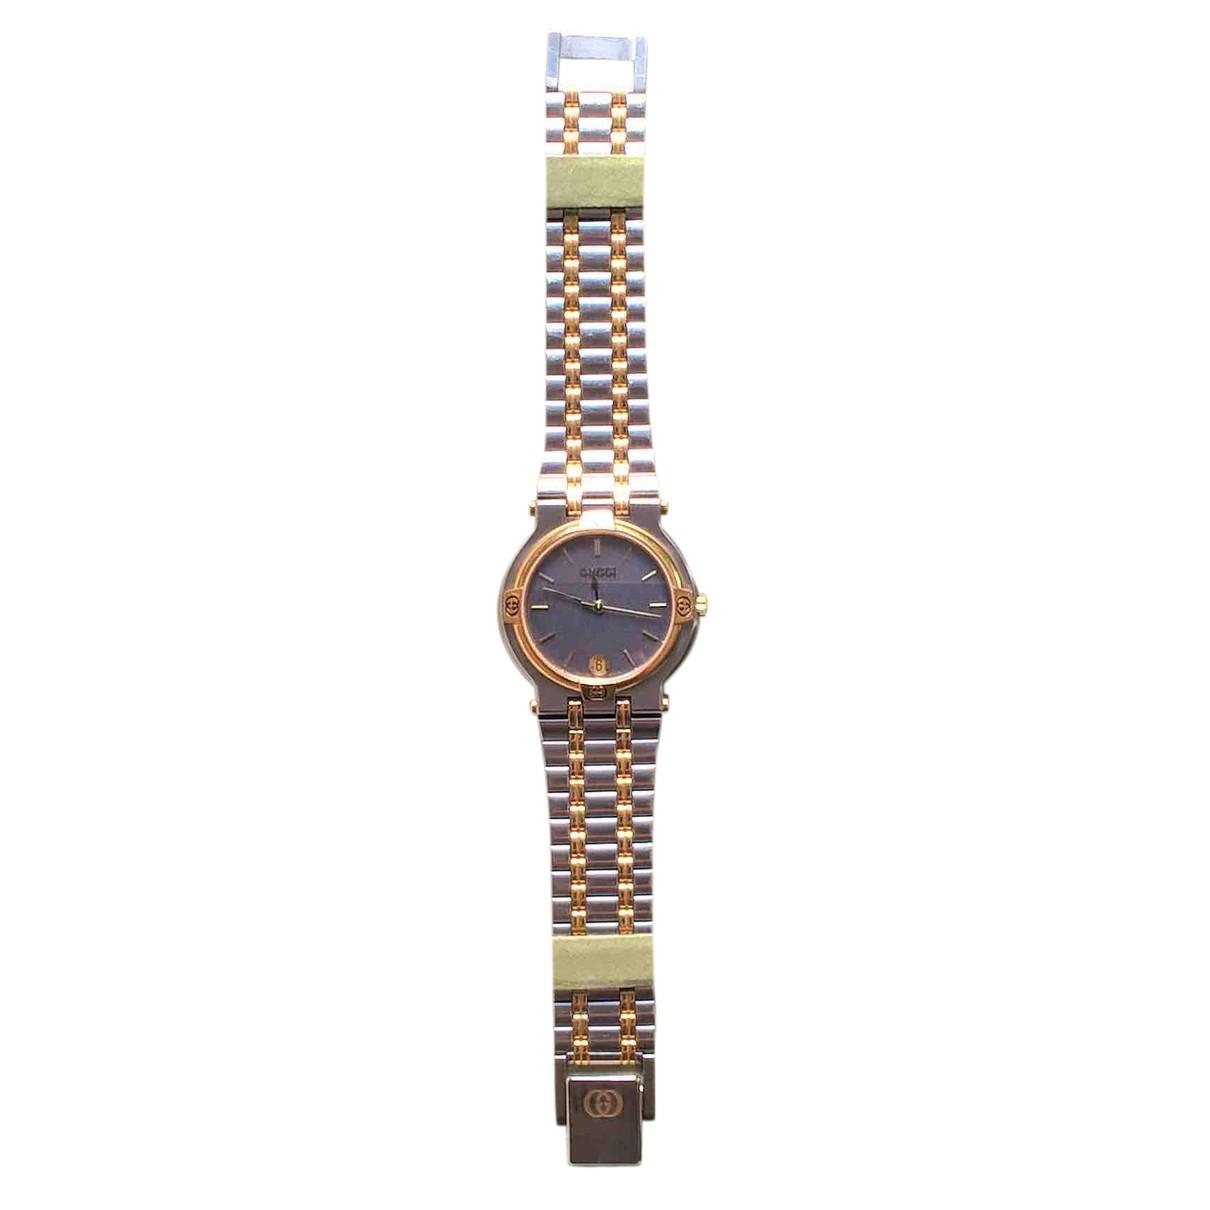 Gucci \N Uhr in  Silber Vergoldet